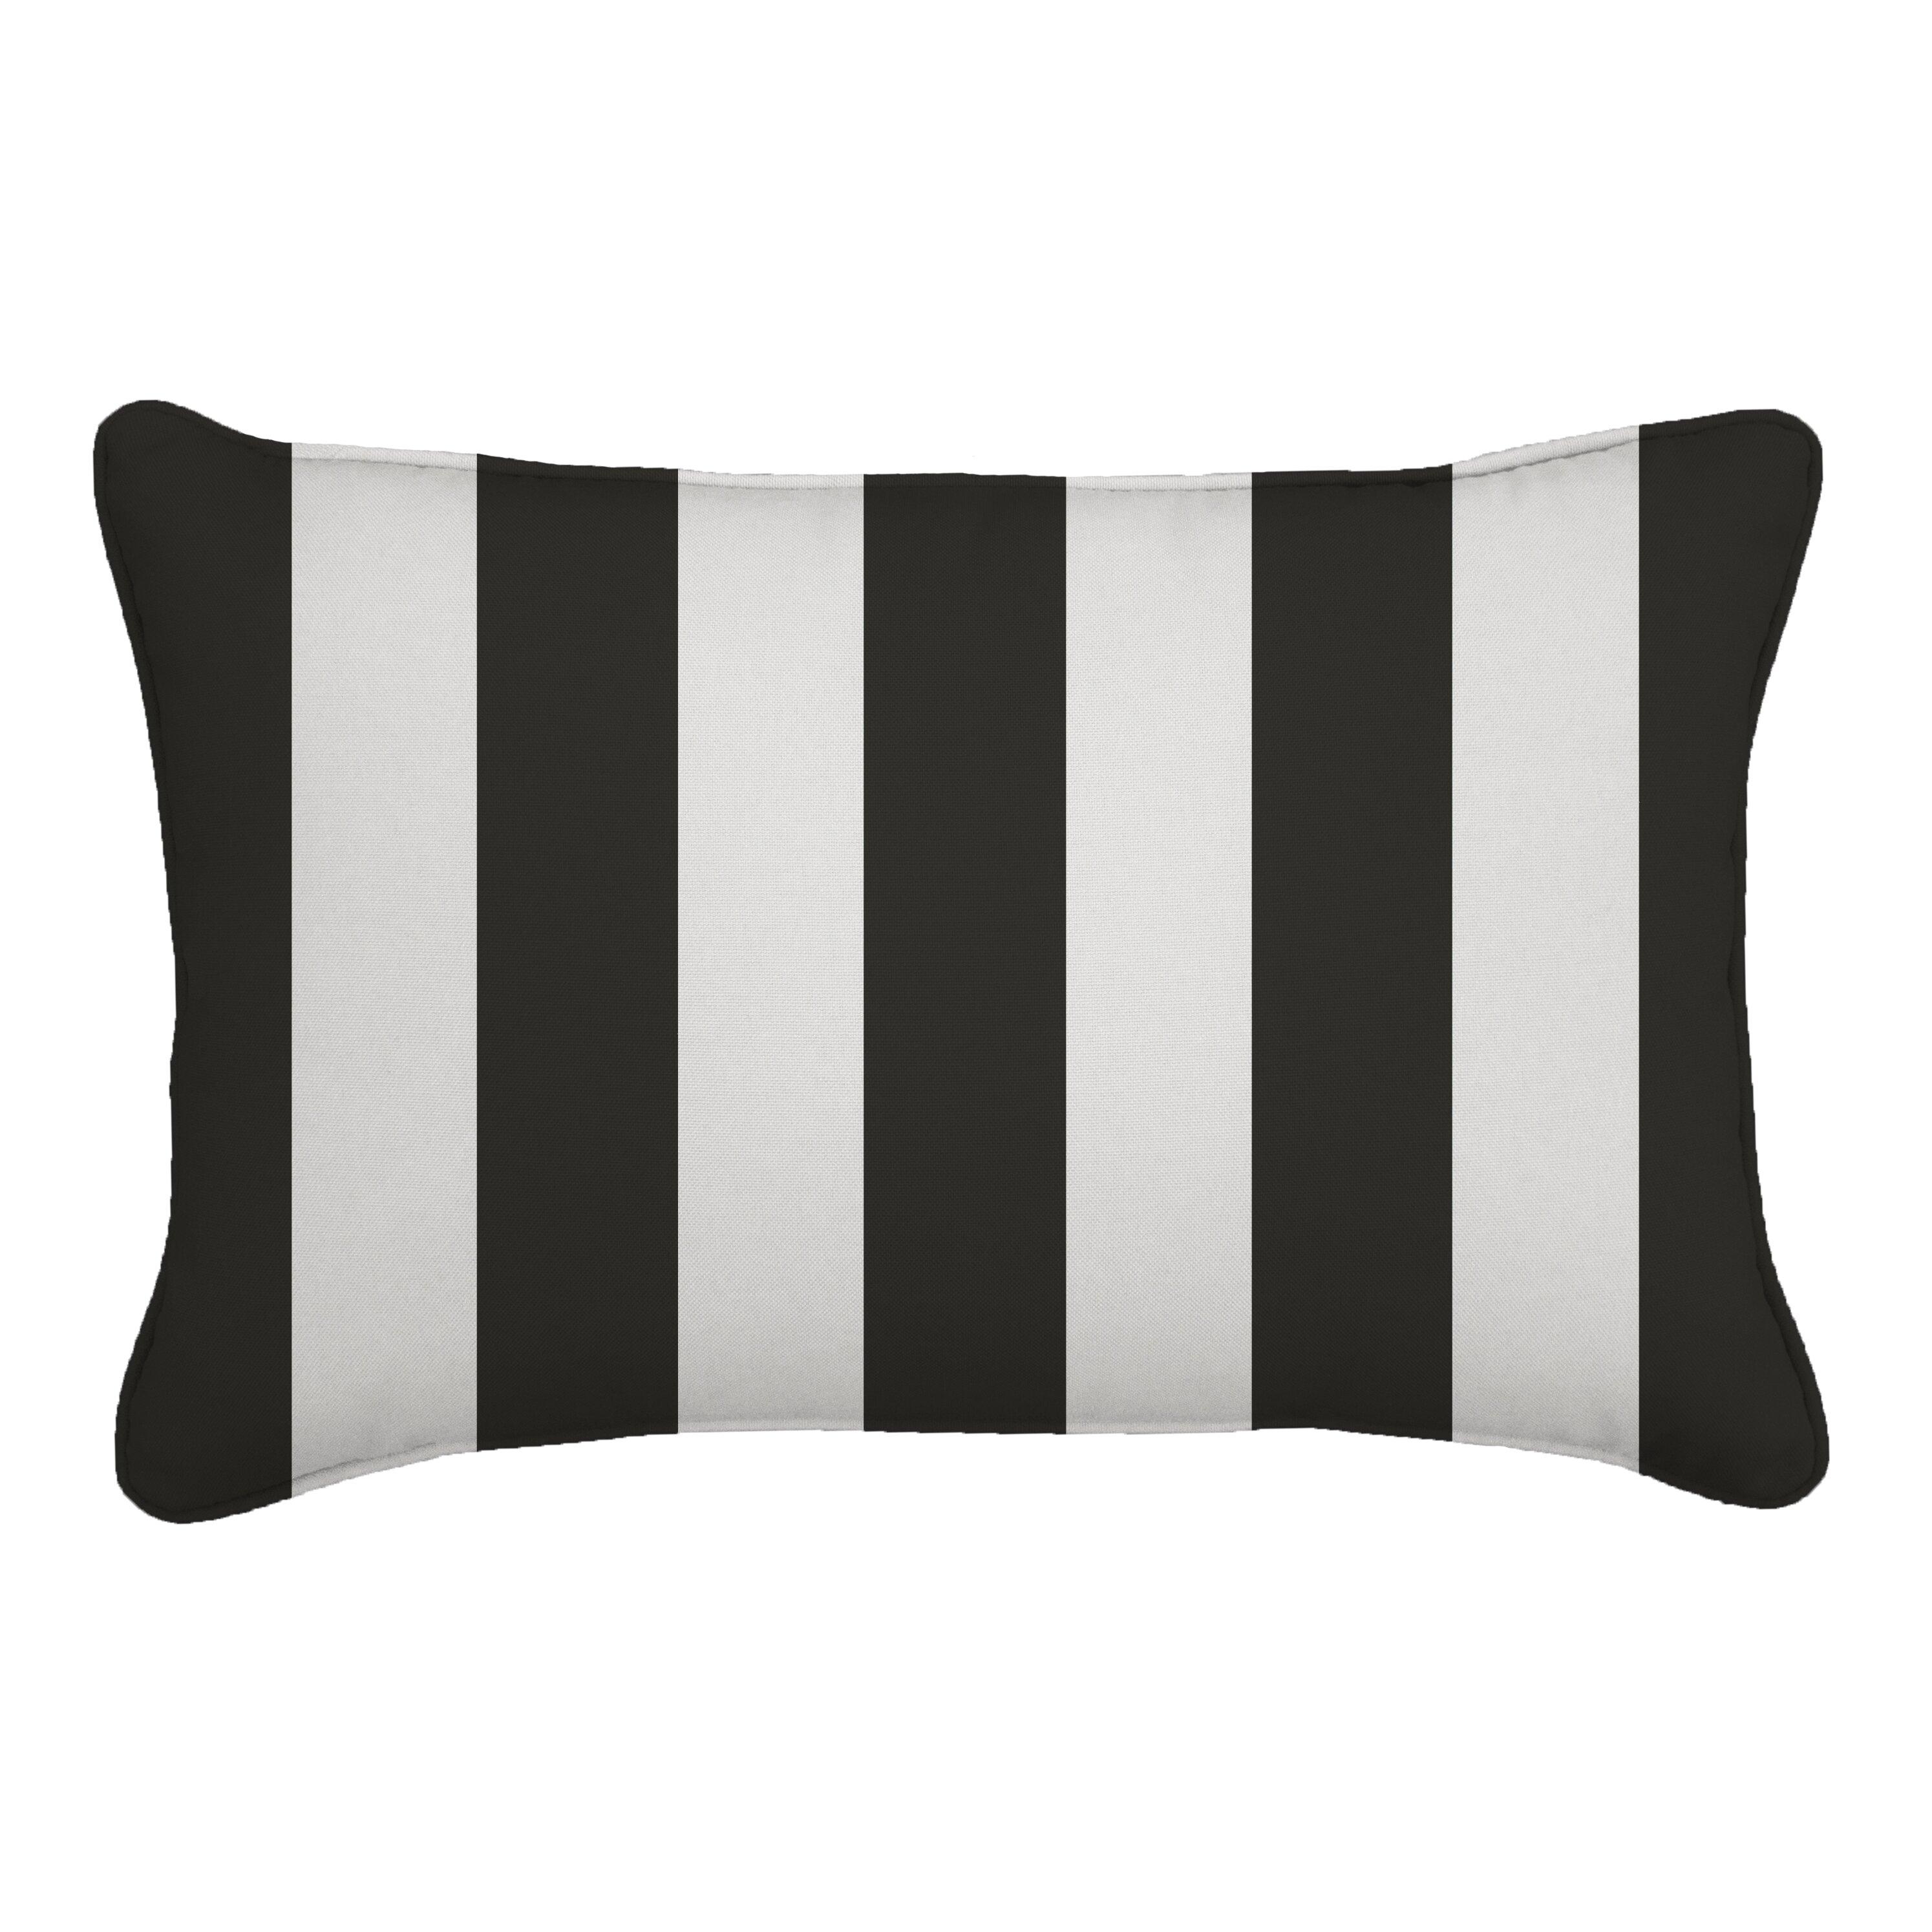 Custom Sunbrella Throw Pillows : Wayfair Custom Outdoor Cushions Outdoor Sunbrella Lumbar Pillow & Reviews Wayfair